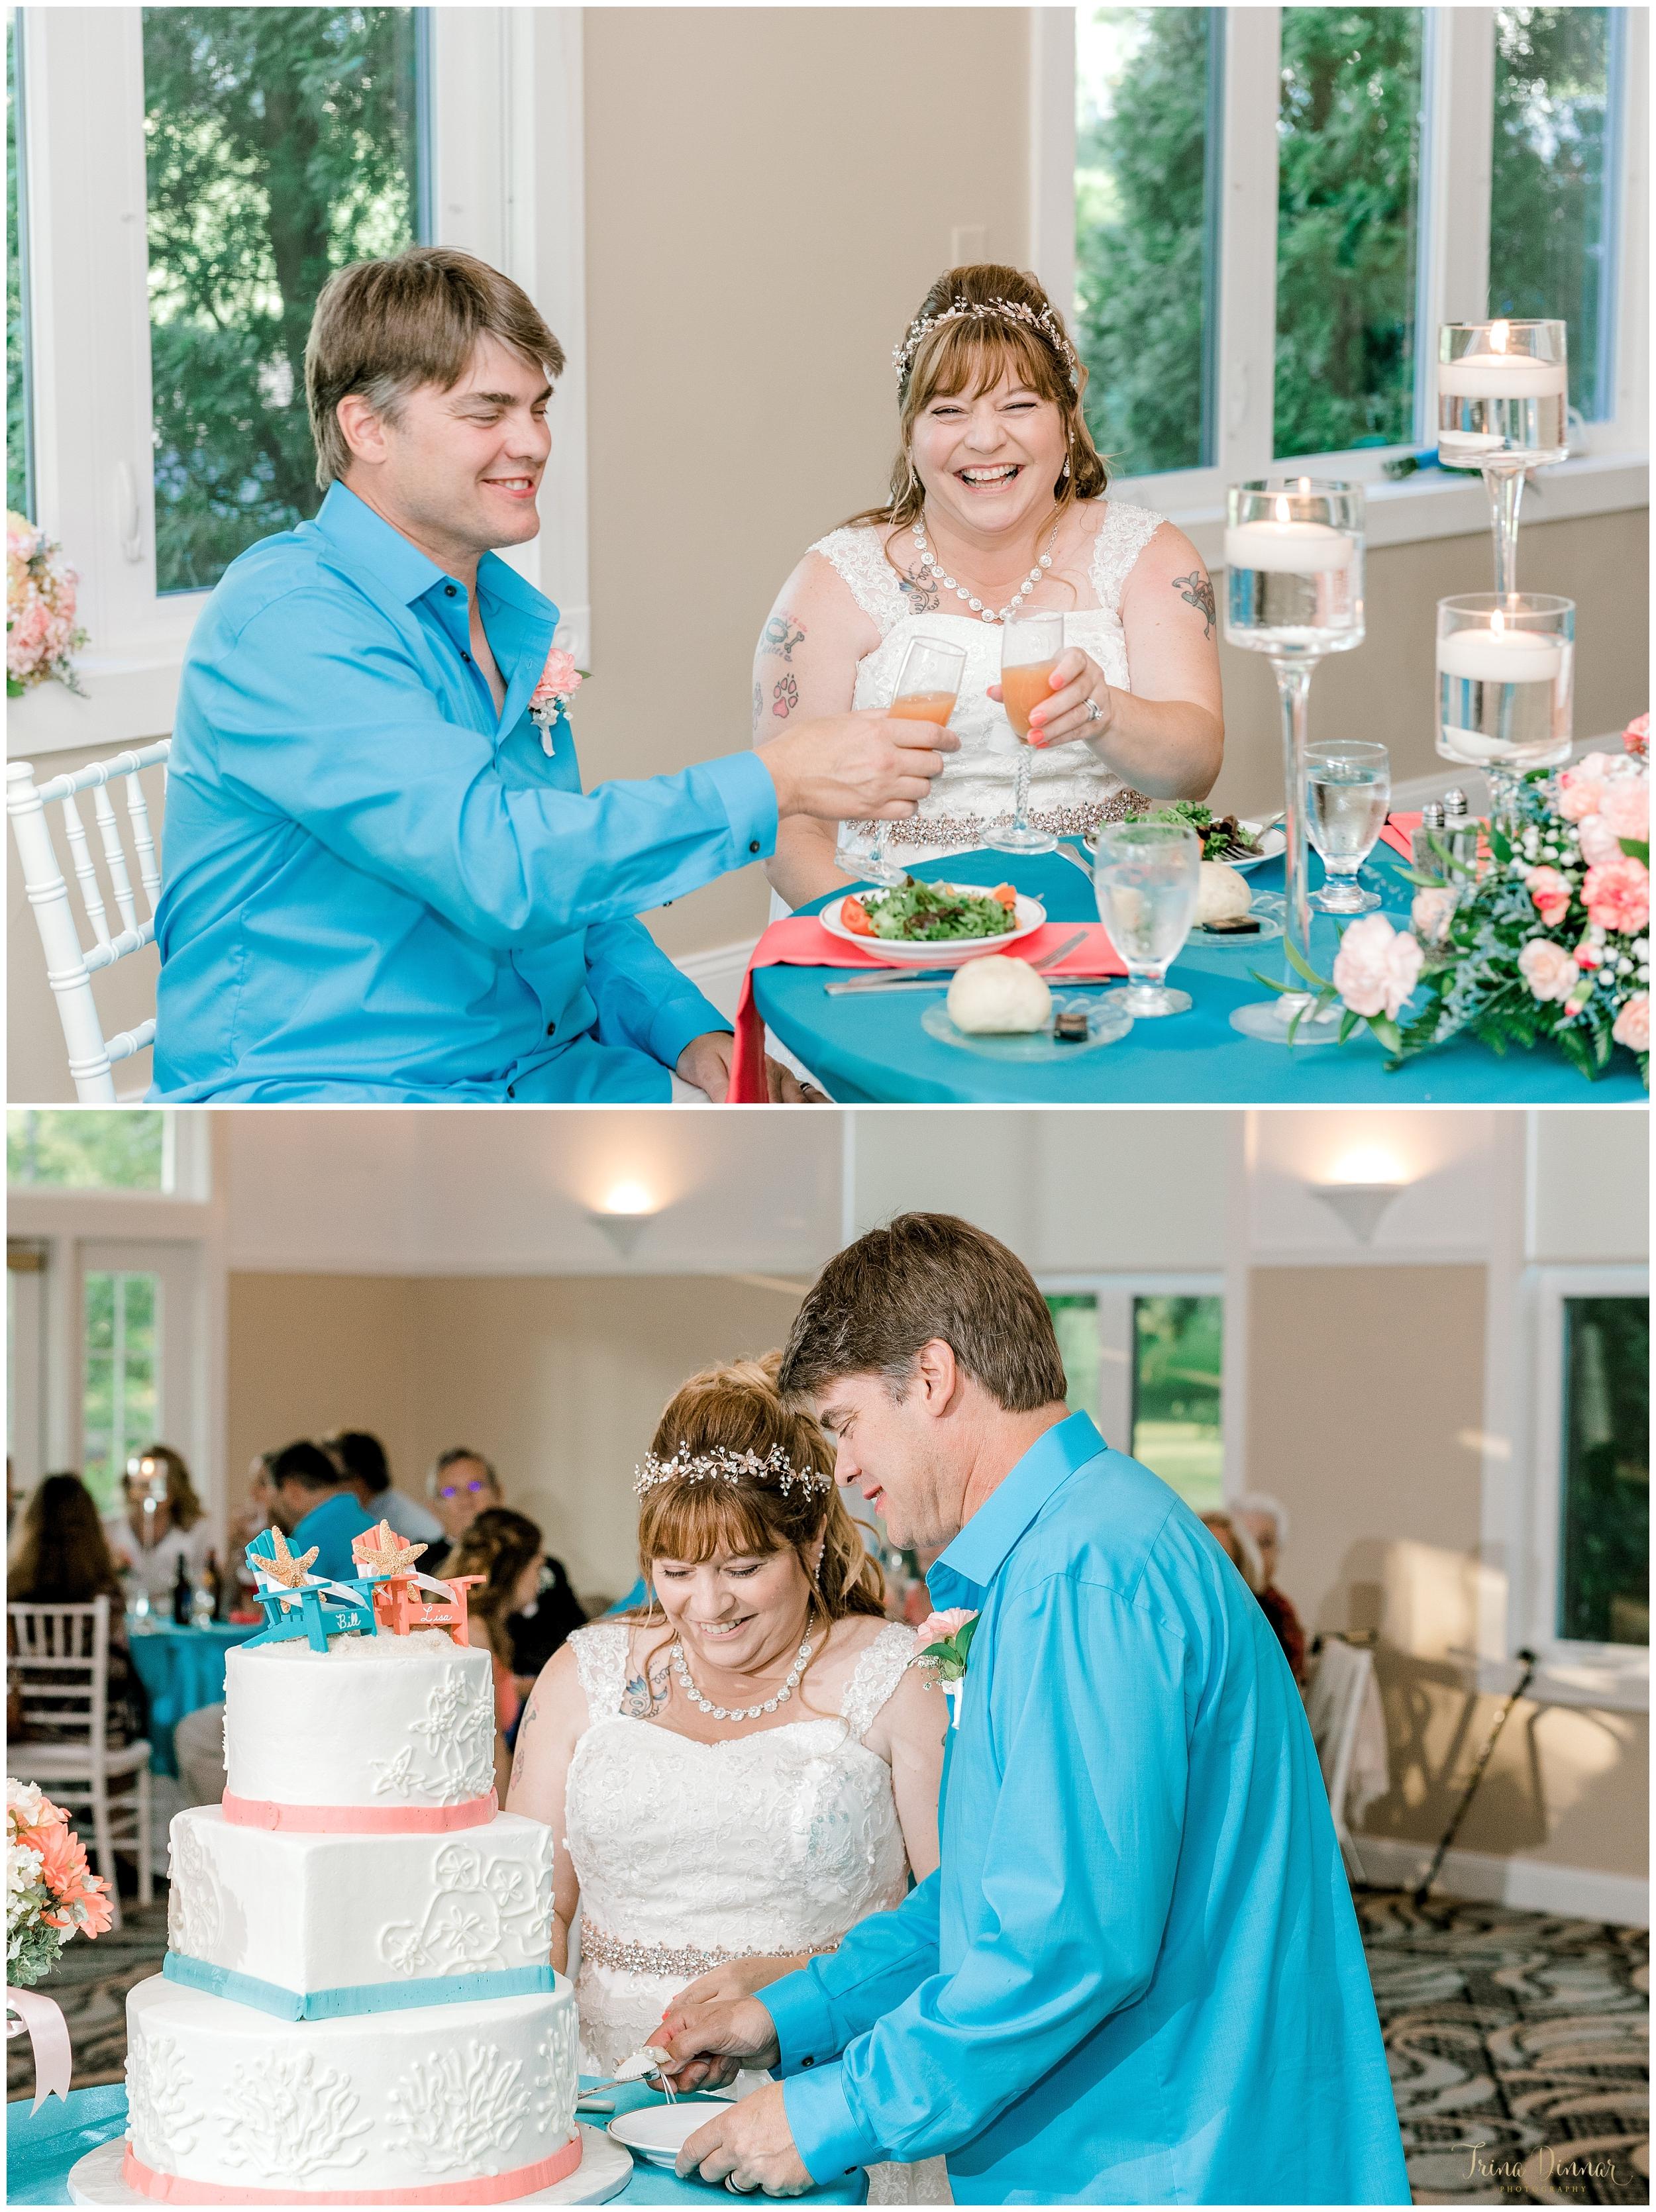 Toasts and cake cutting wedding photos